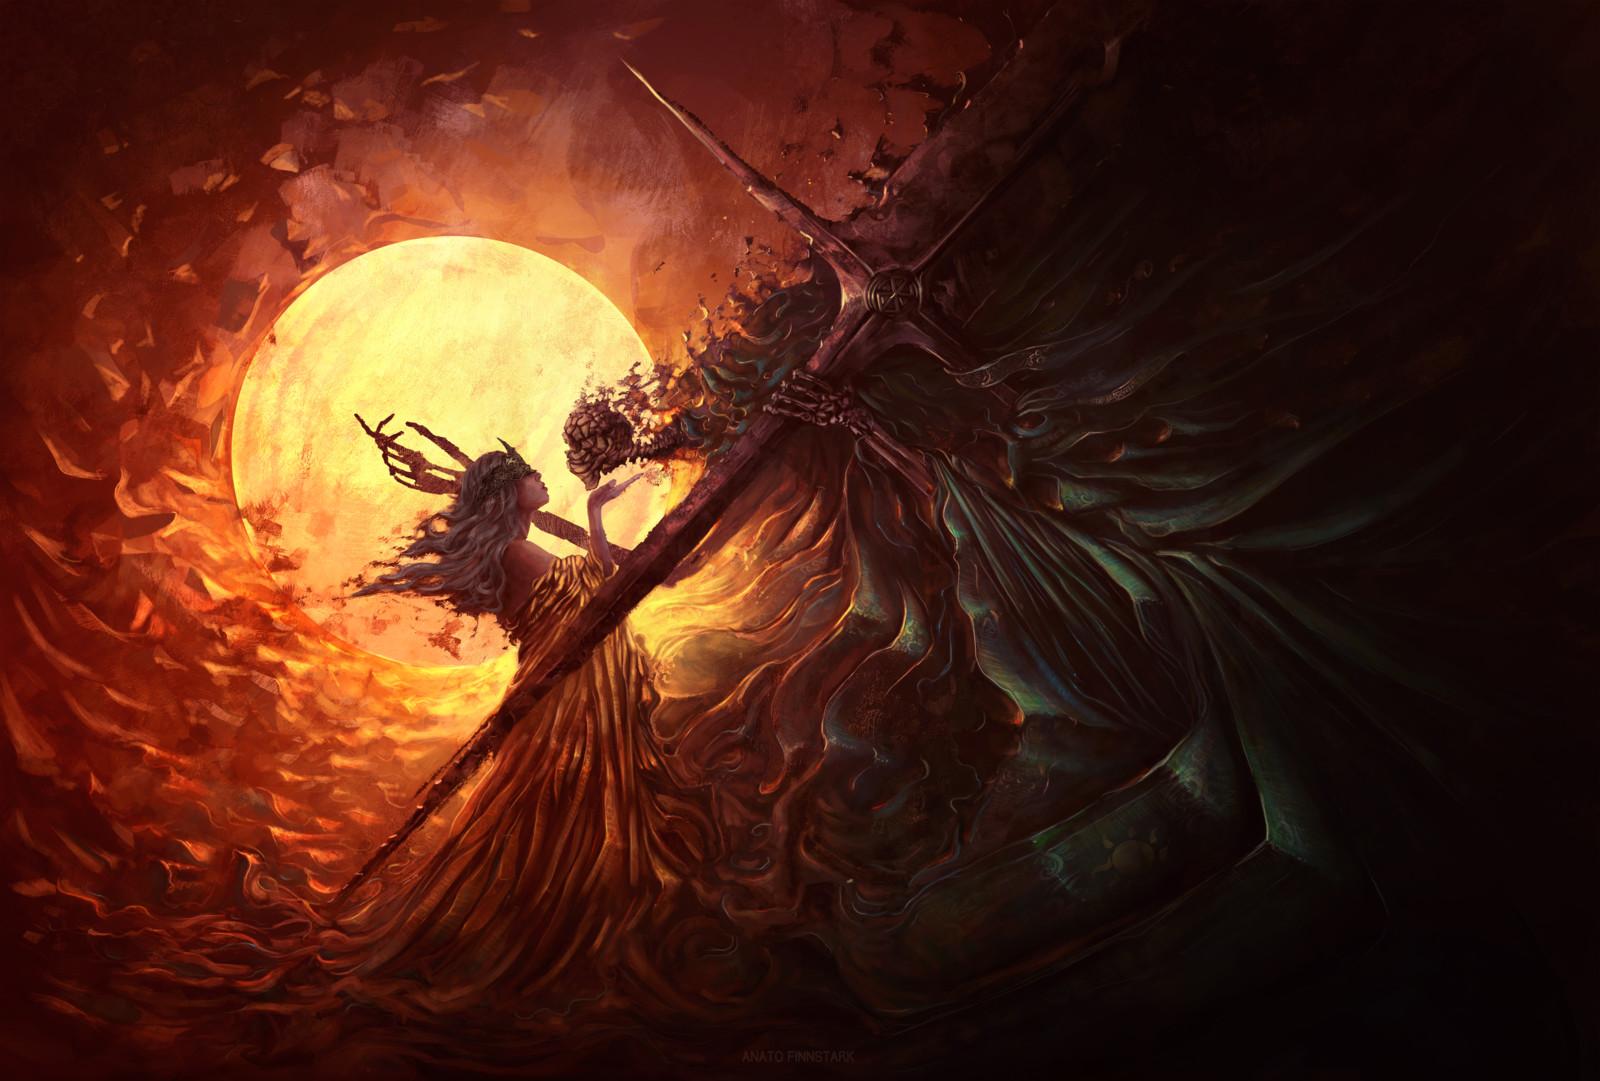 Anato finnstark so frail dark souls by anatofinnstark dc06ove